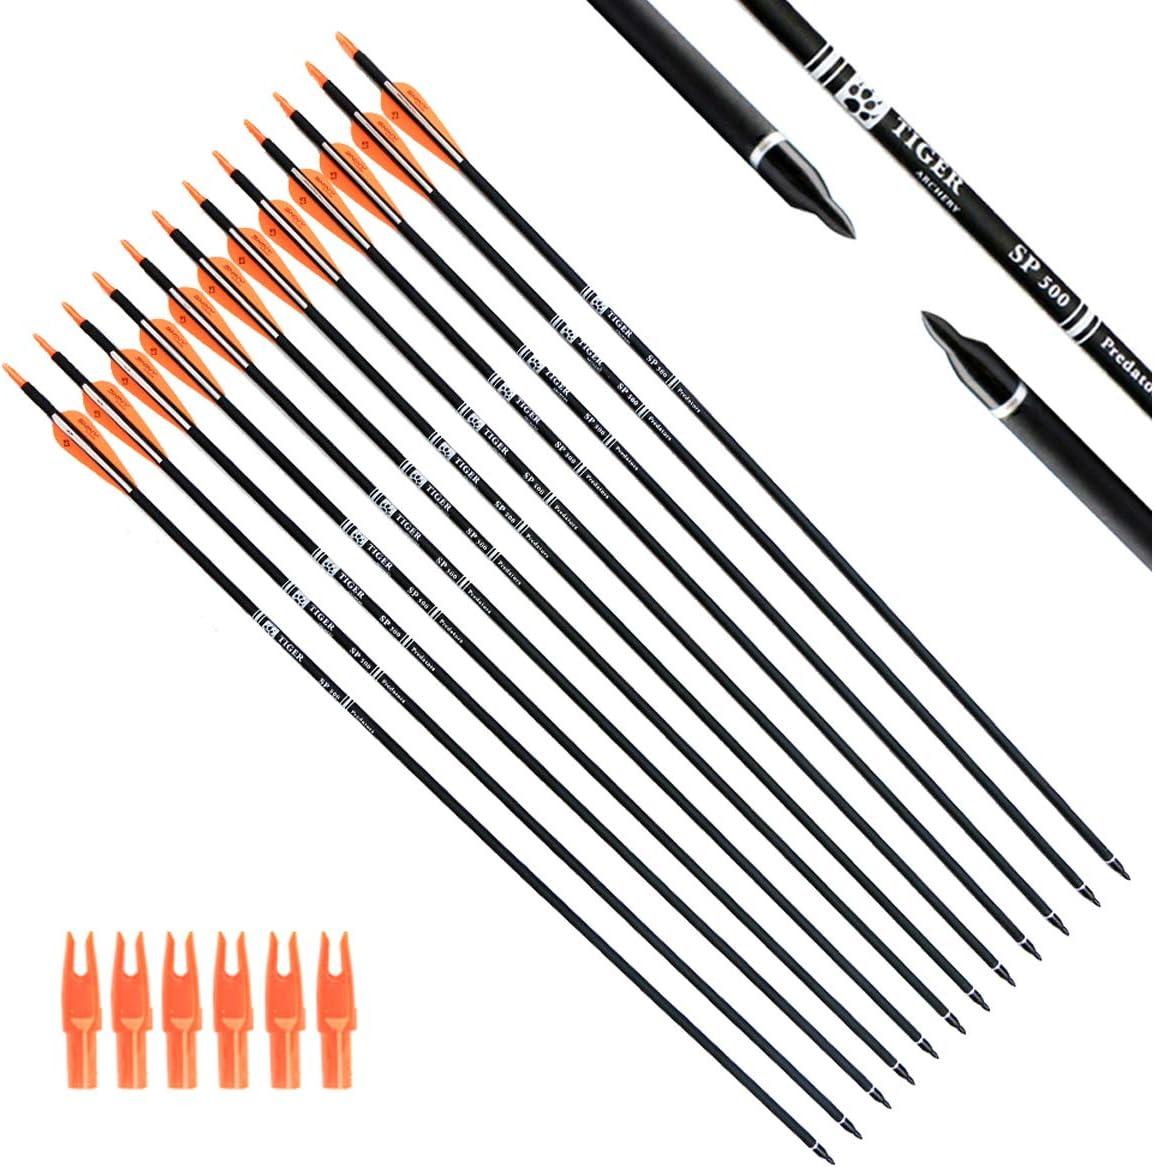 Best Archery Arrows: Tiger Archery 30Inch Carbon